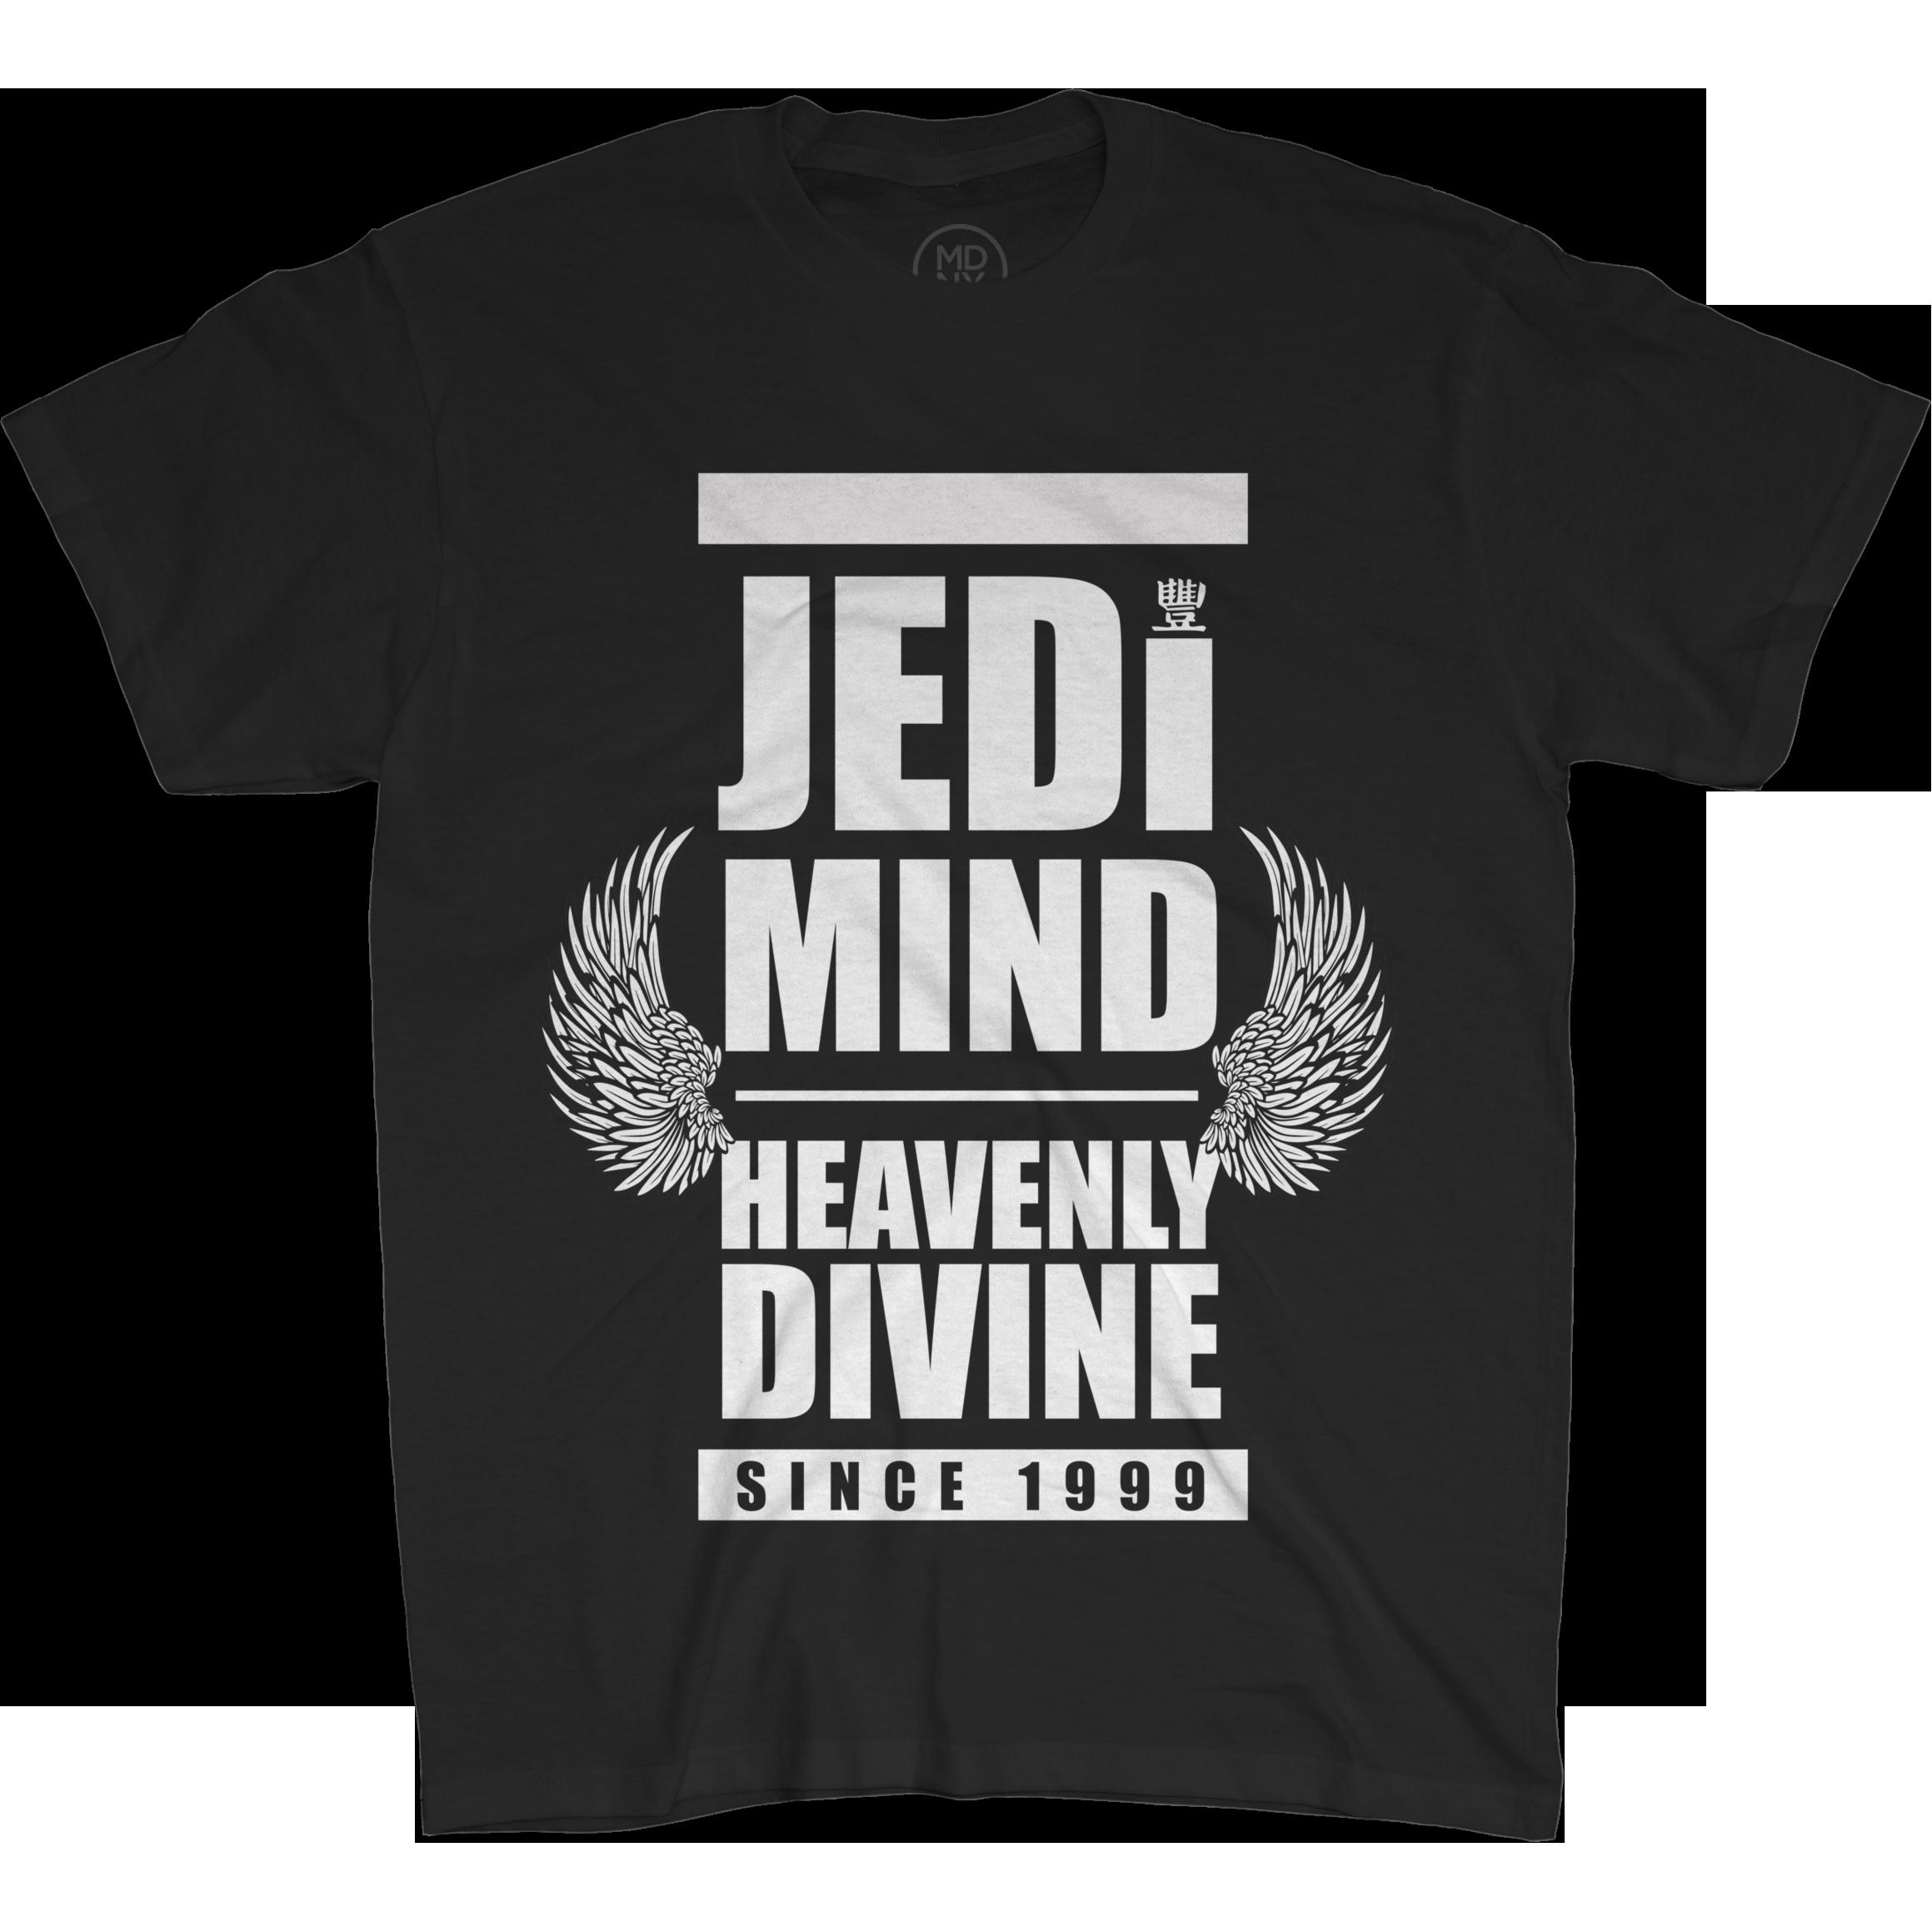 Heavenly Divine - T-Shirt